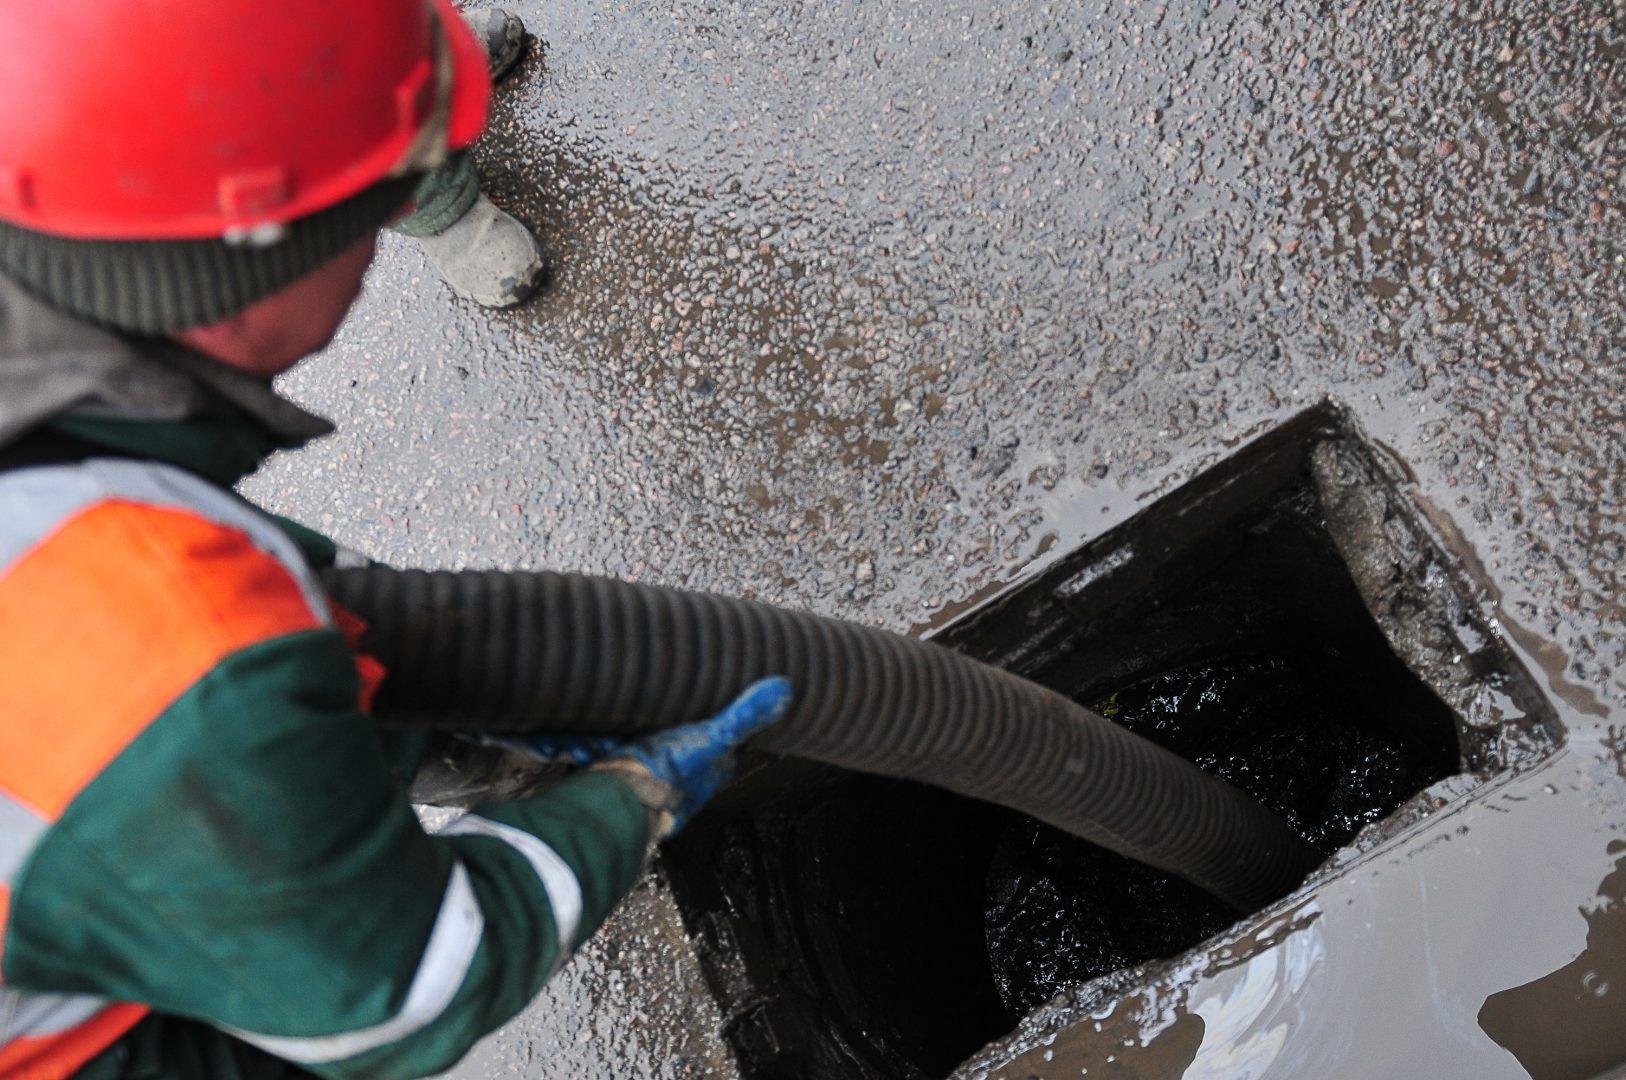 Строительство канализационной станции закончат до конца 2021 года в Прокшине. Фото: Александр Казаков, «Вечерняя Москва»